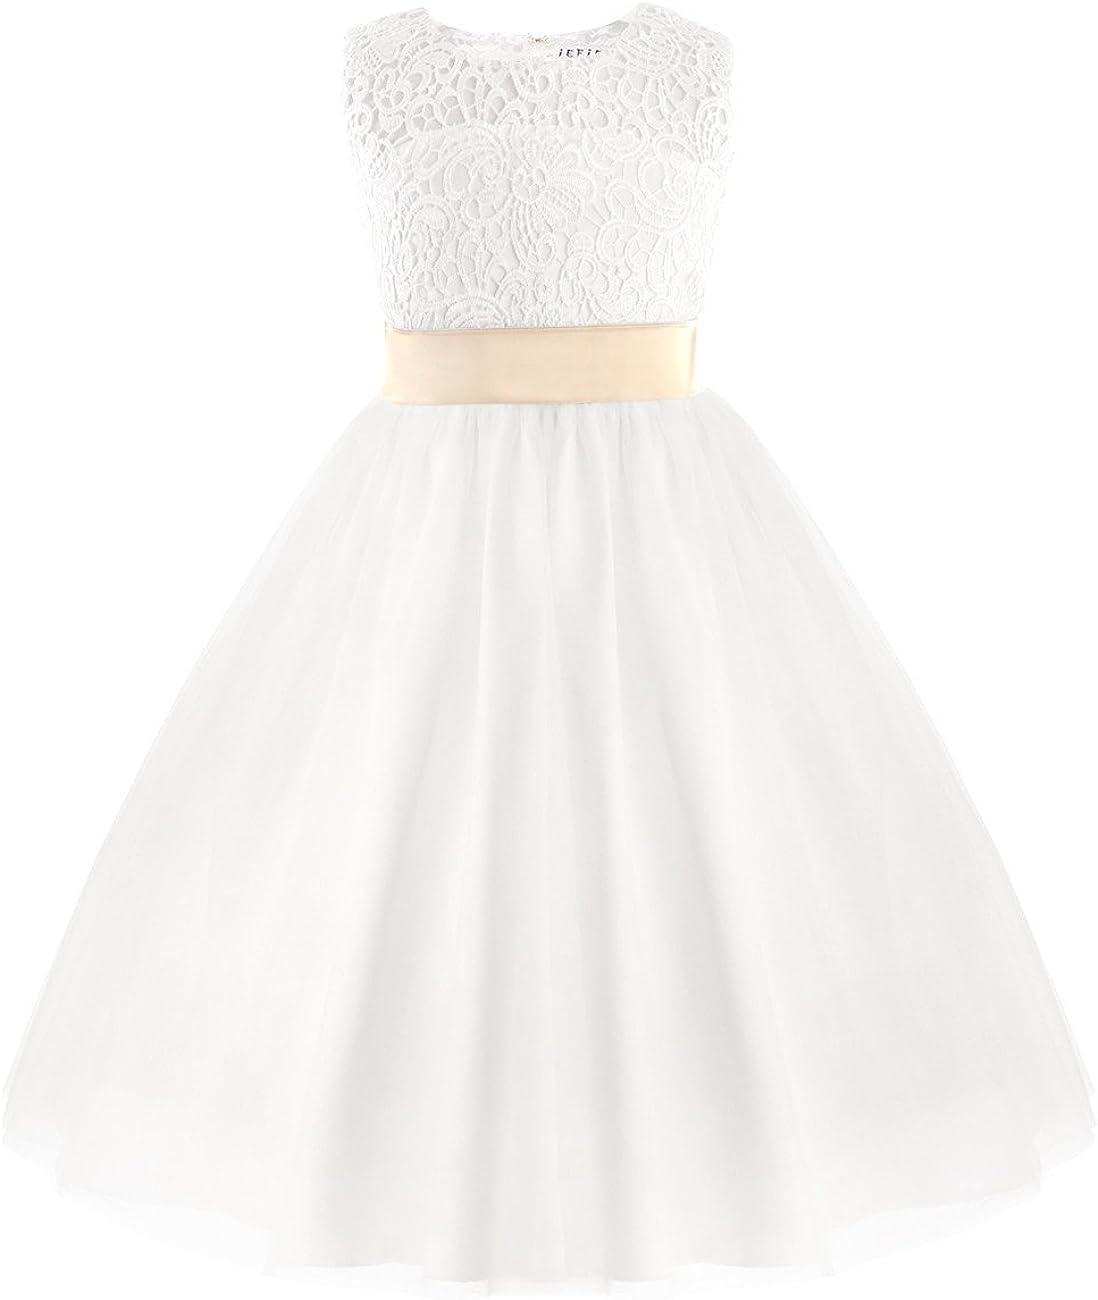 TiaoBug Kids Girls Flower Dress Princess Pageant Wedding Birthday Party Prom Ball Gown Dresses